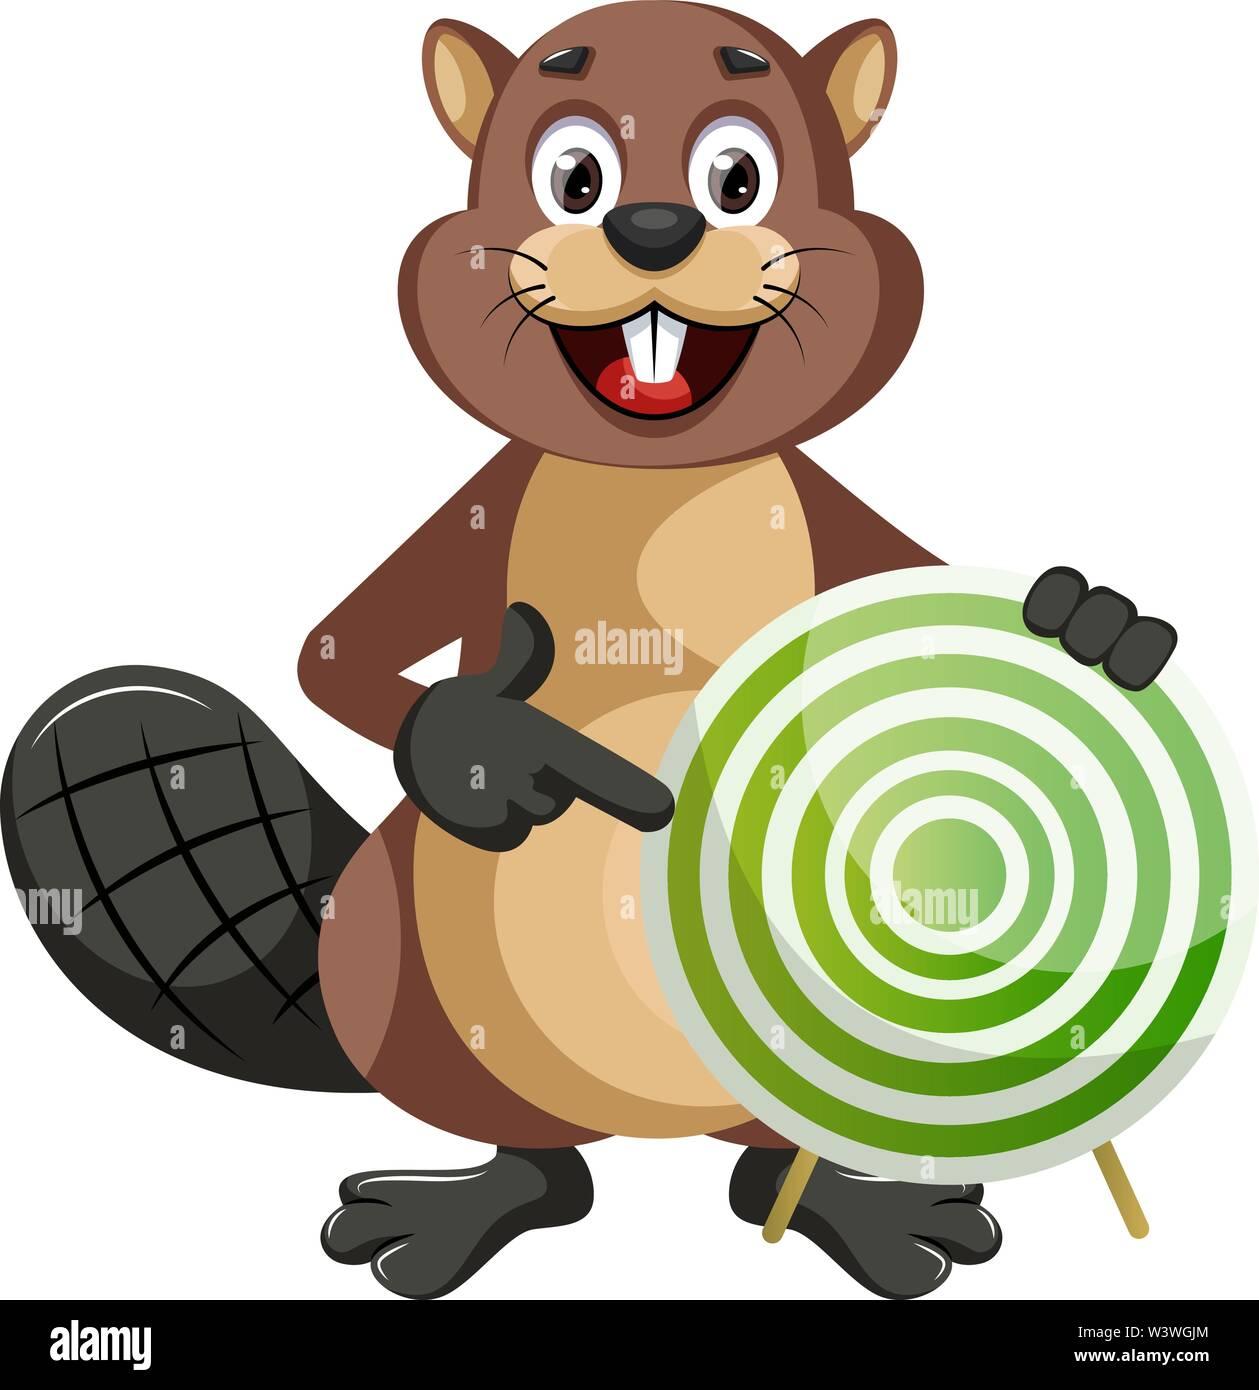 Beaver holding target, illustration, vector on white background. - Stock Image